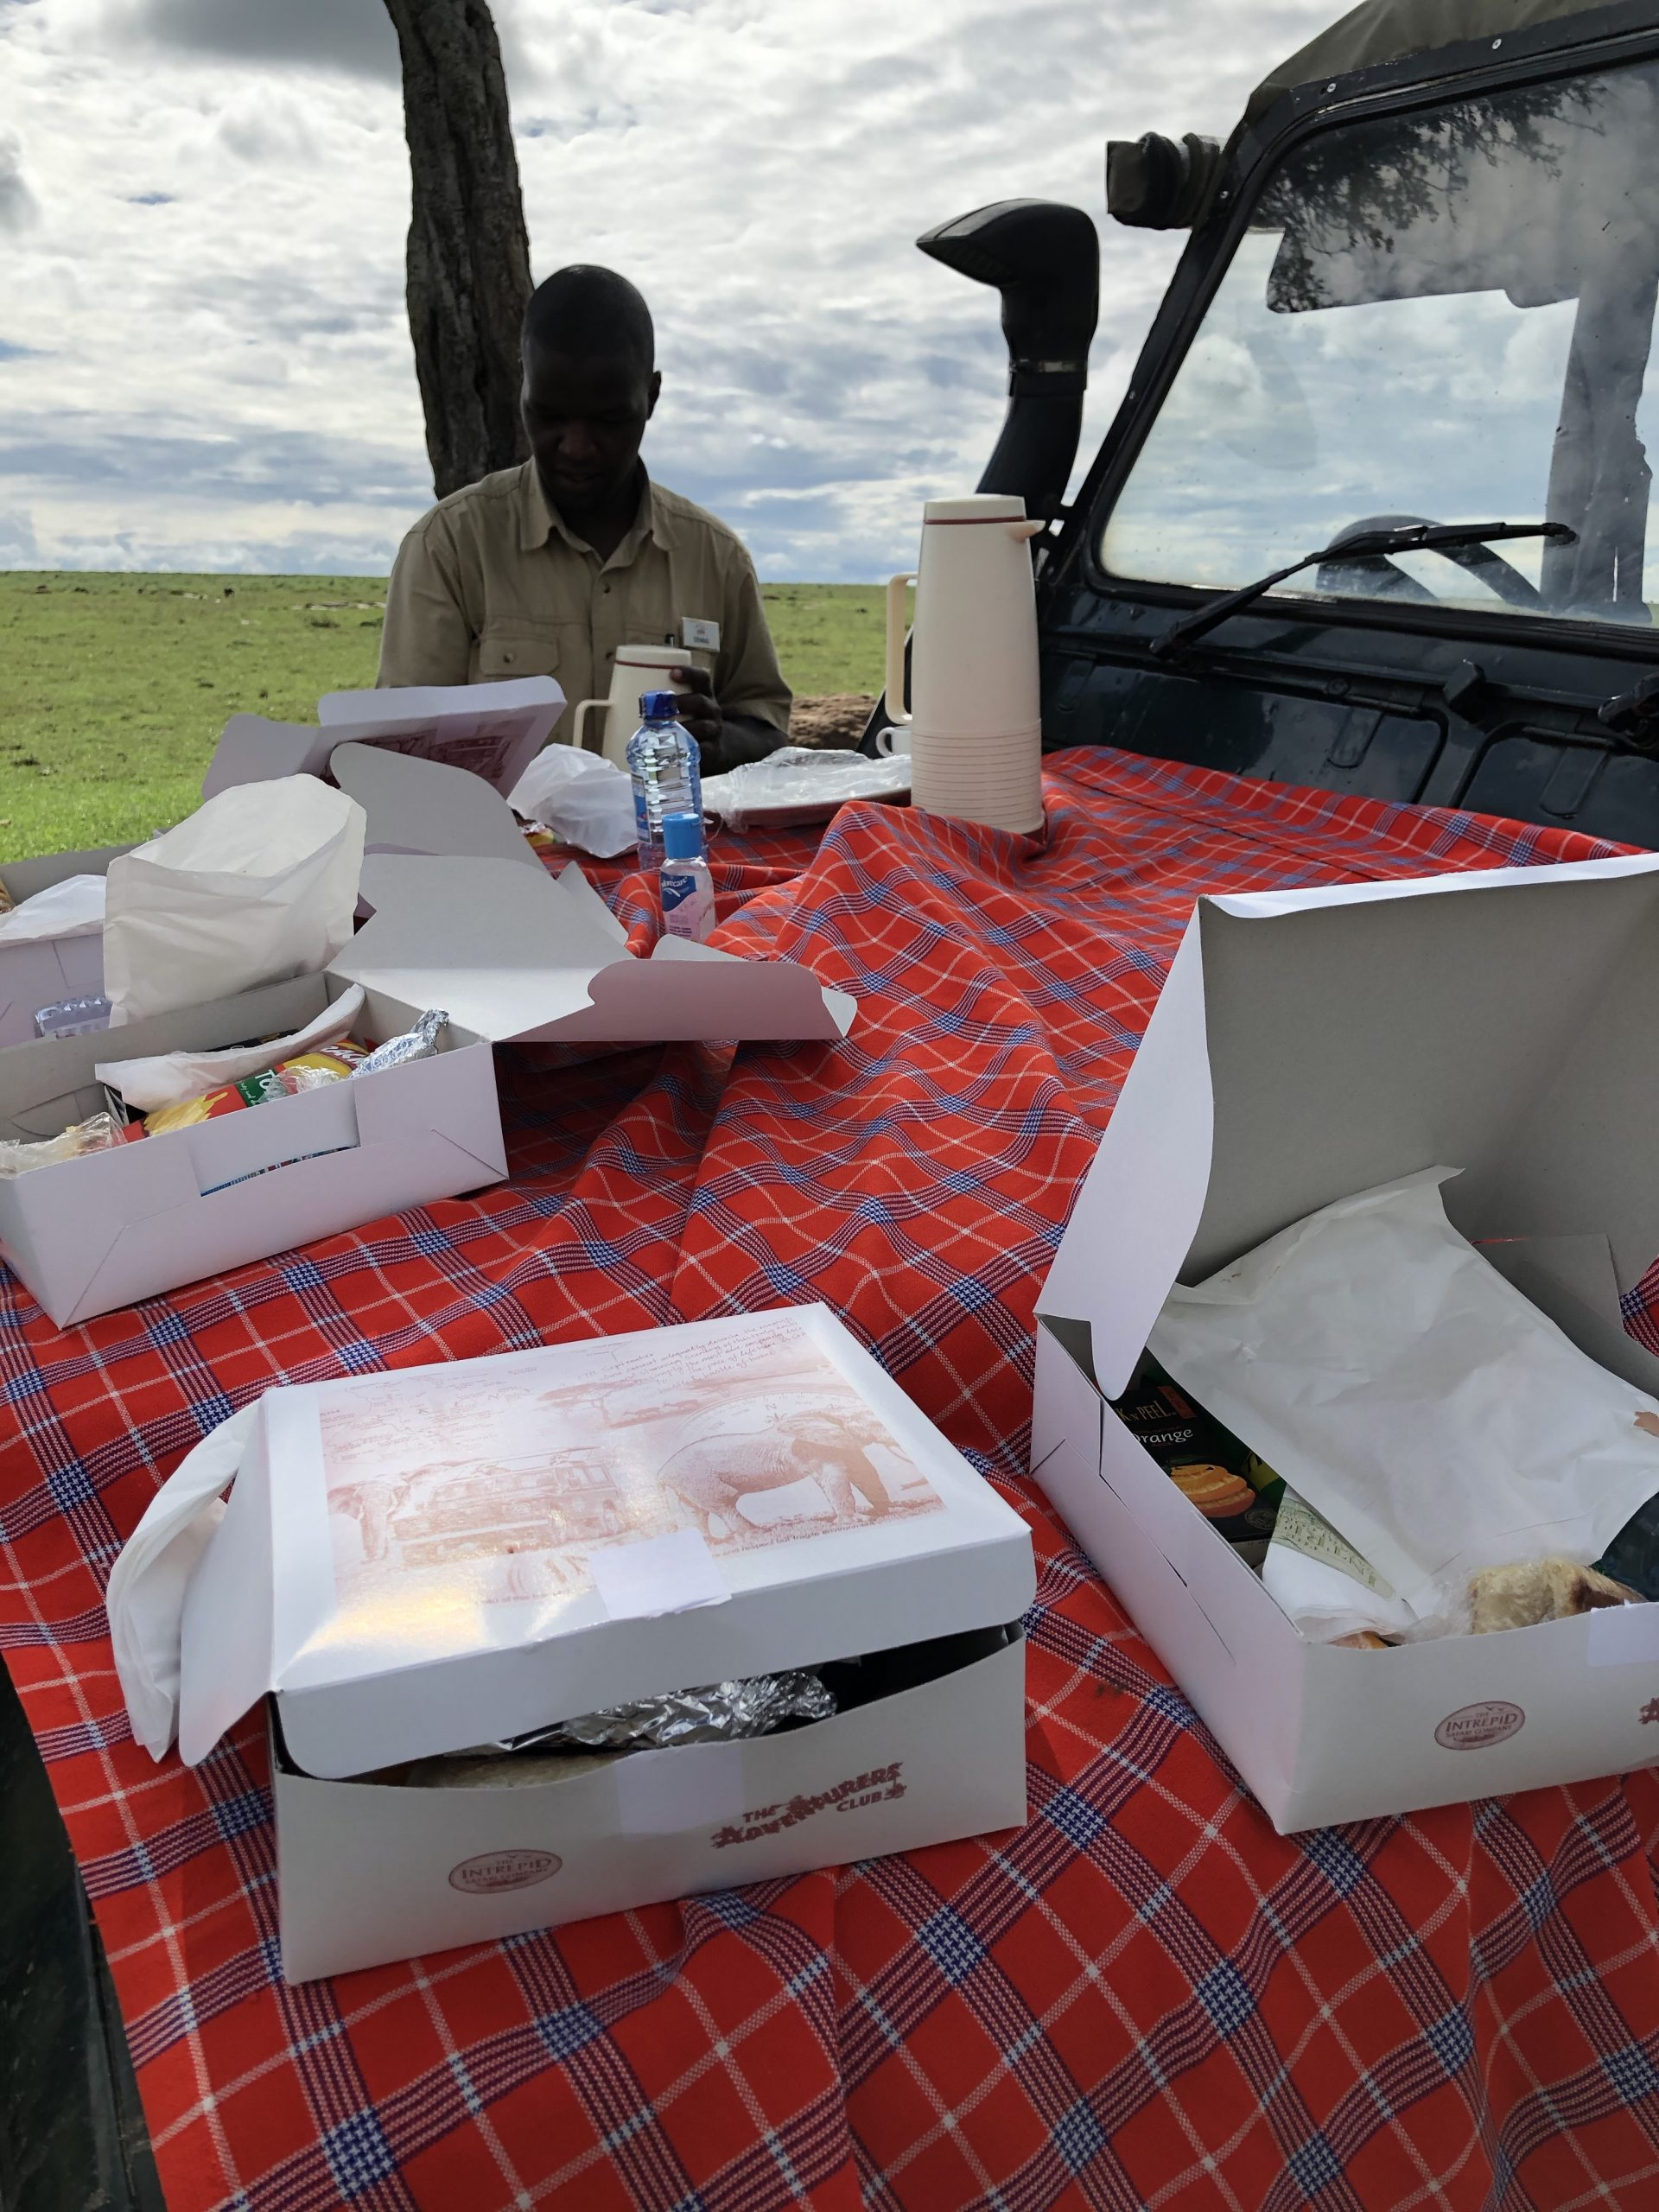 box lunch on hood of safari jeep